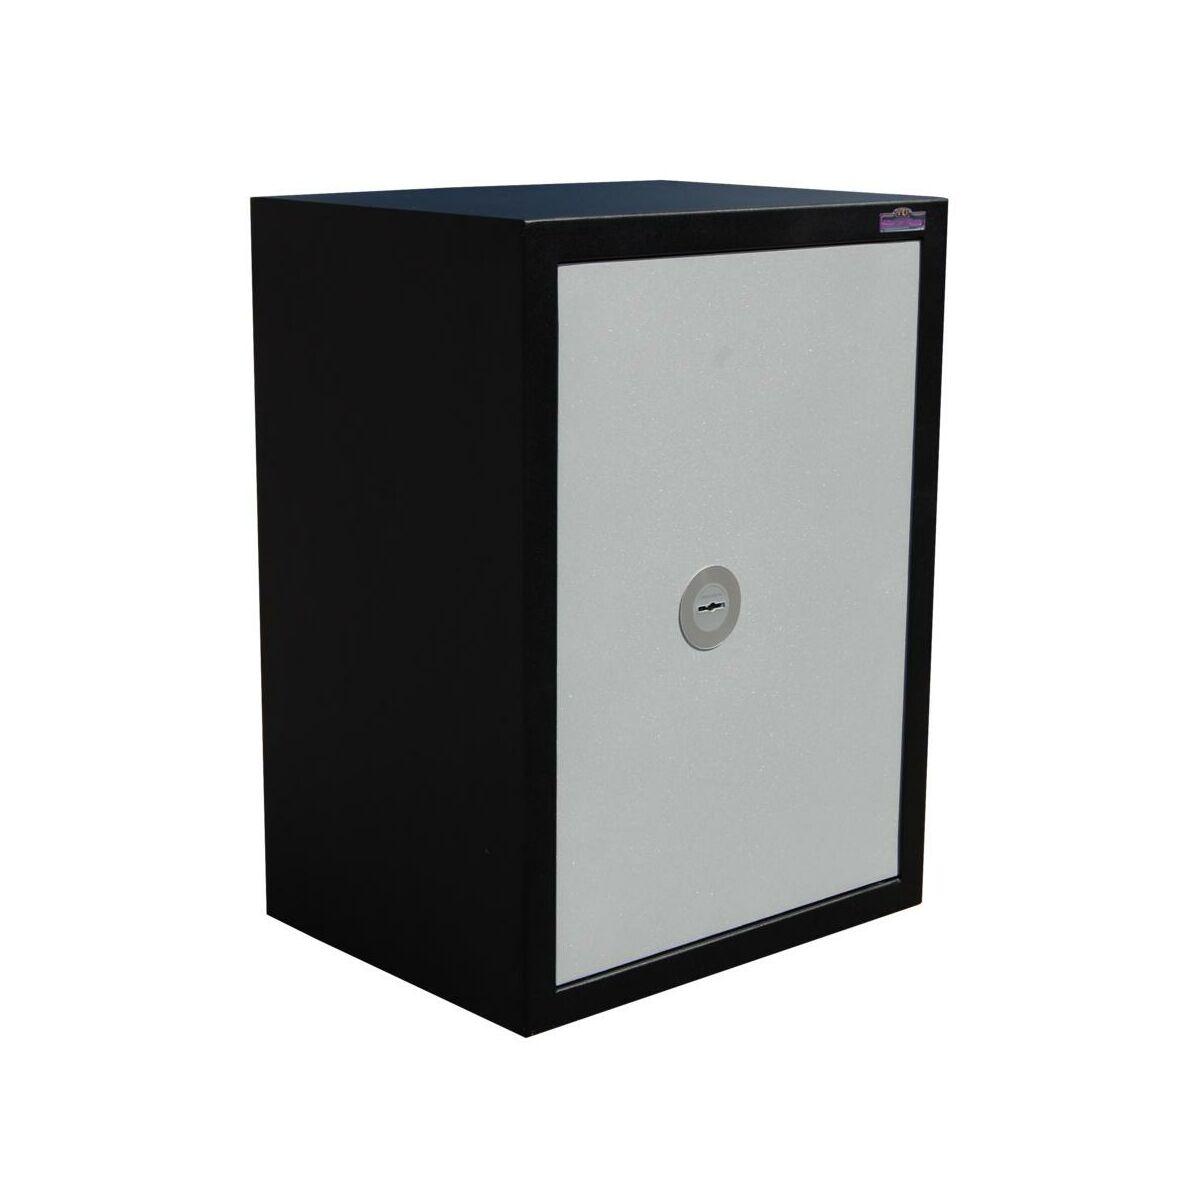 sejf tg 5sho k9005 mrozik d8 metalkas sejfy w. Black Bedroom Furniture Sets. Home Design Ideas